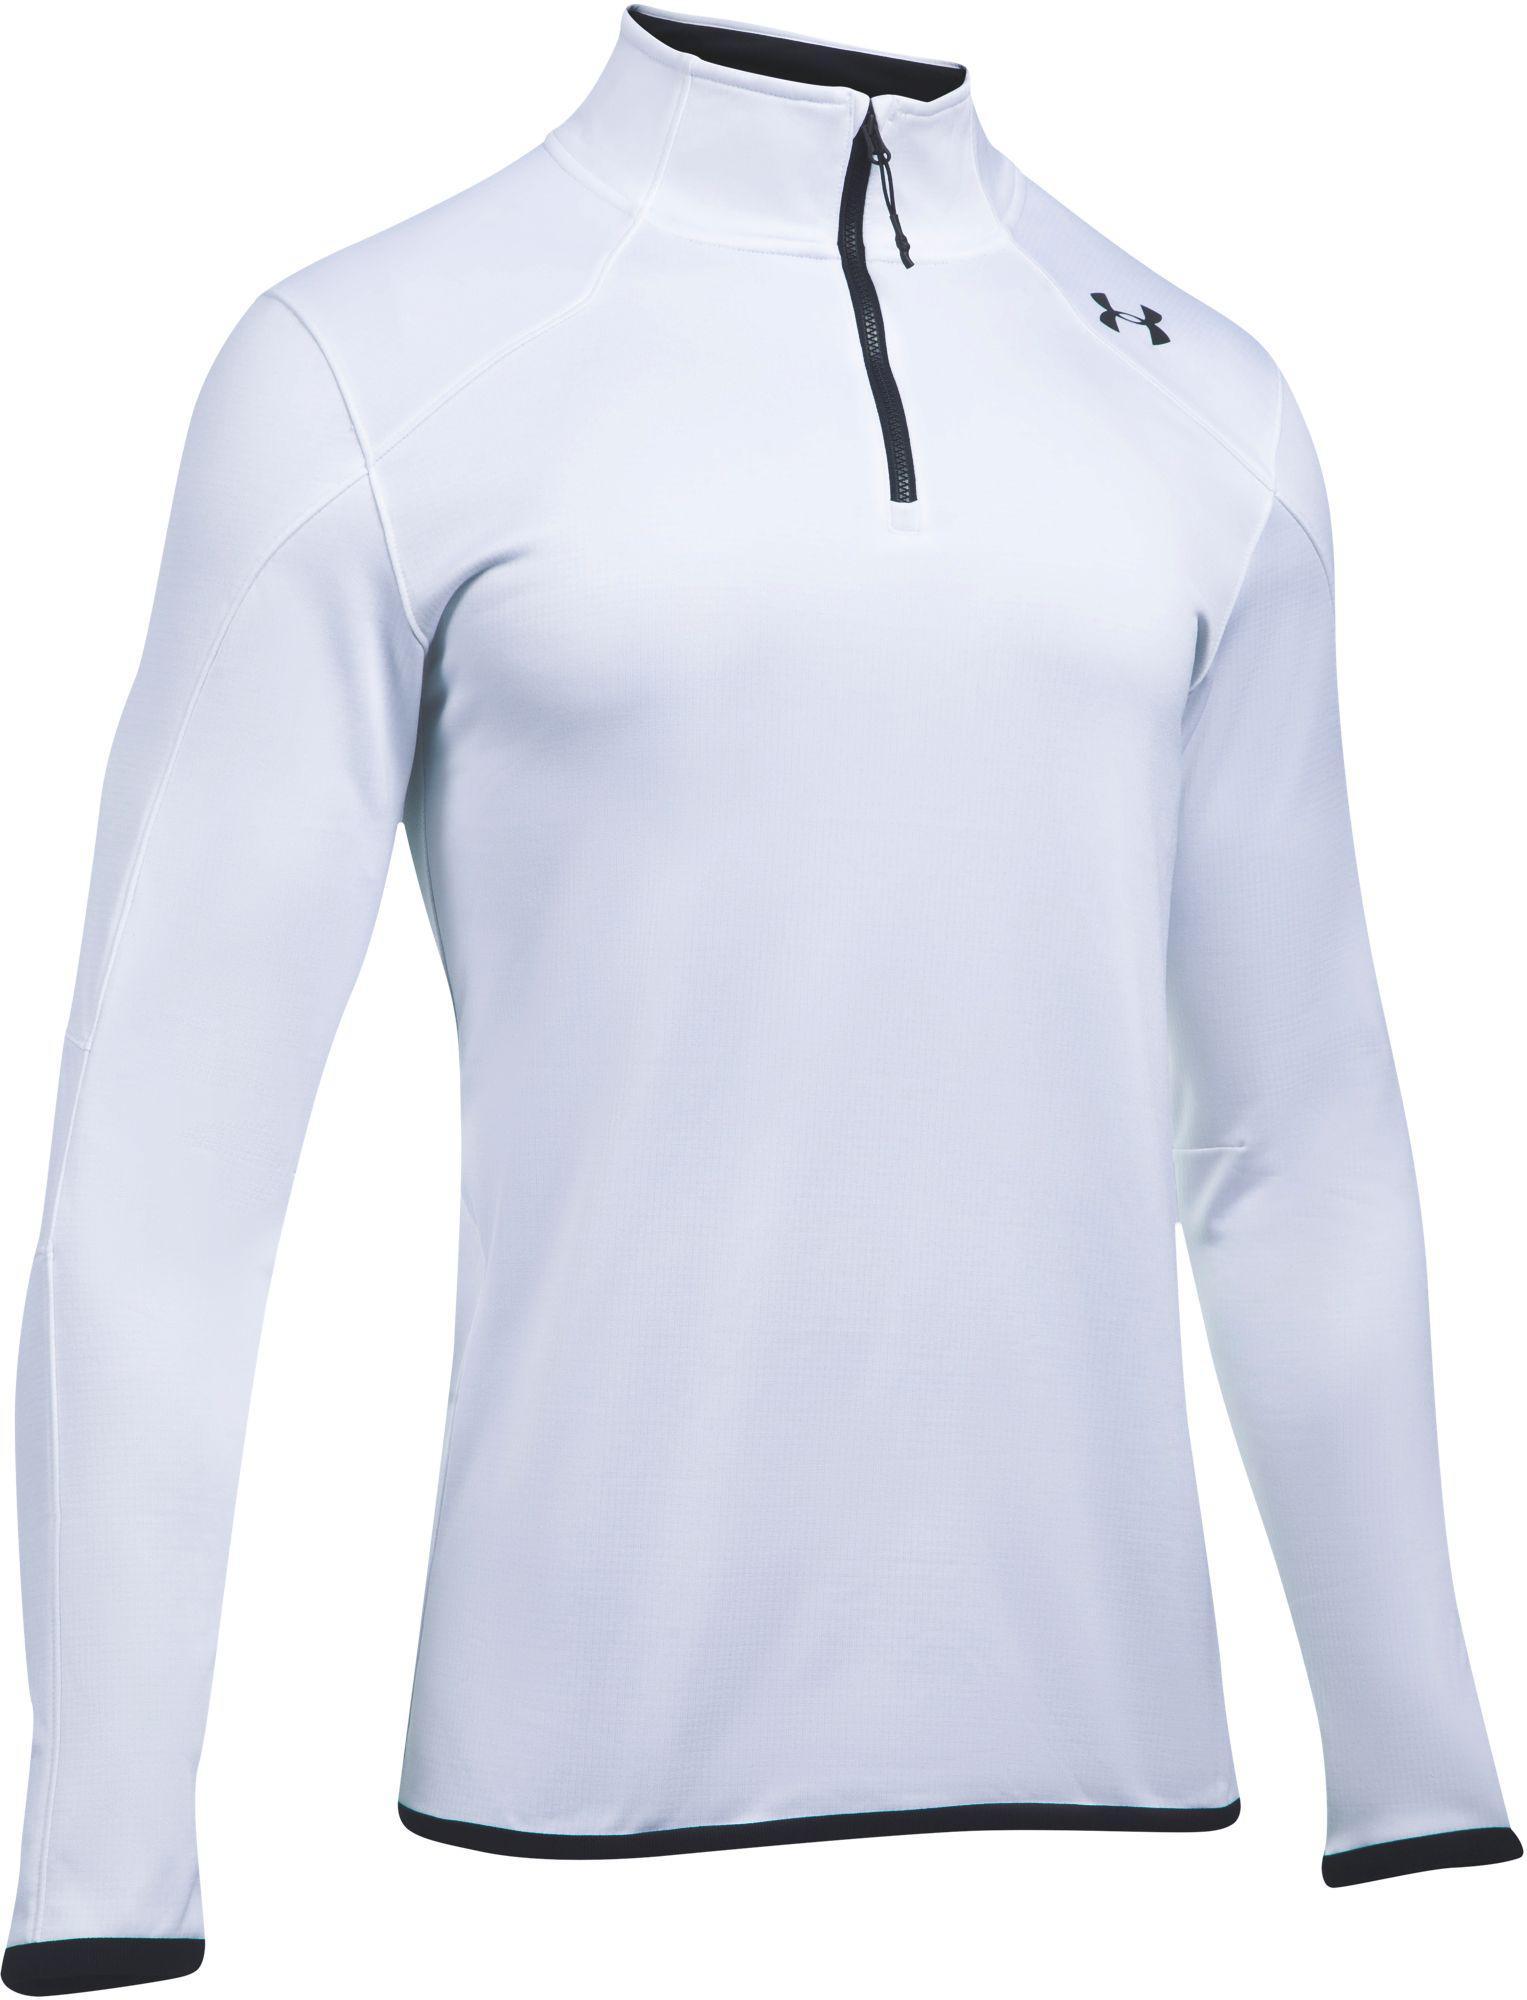 2e5f1407 Under Armour White Coldgear Reactor 1/4 Zip Long Sleeve T-shirt for men